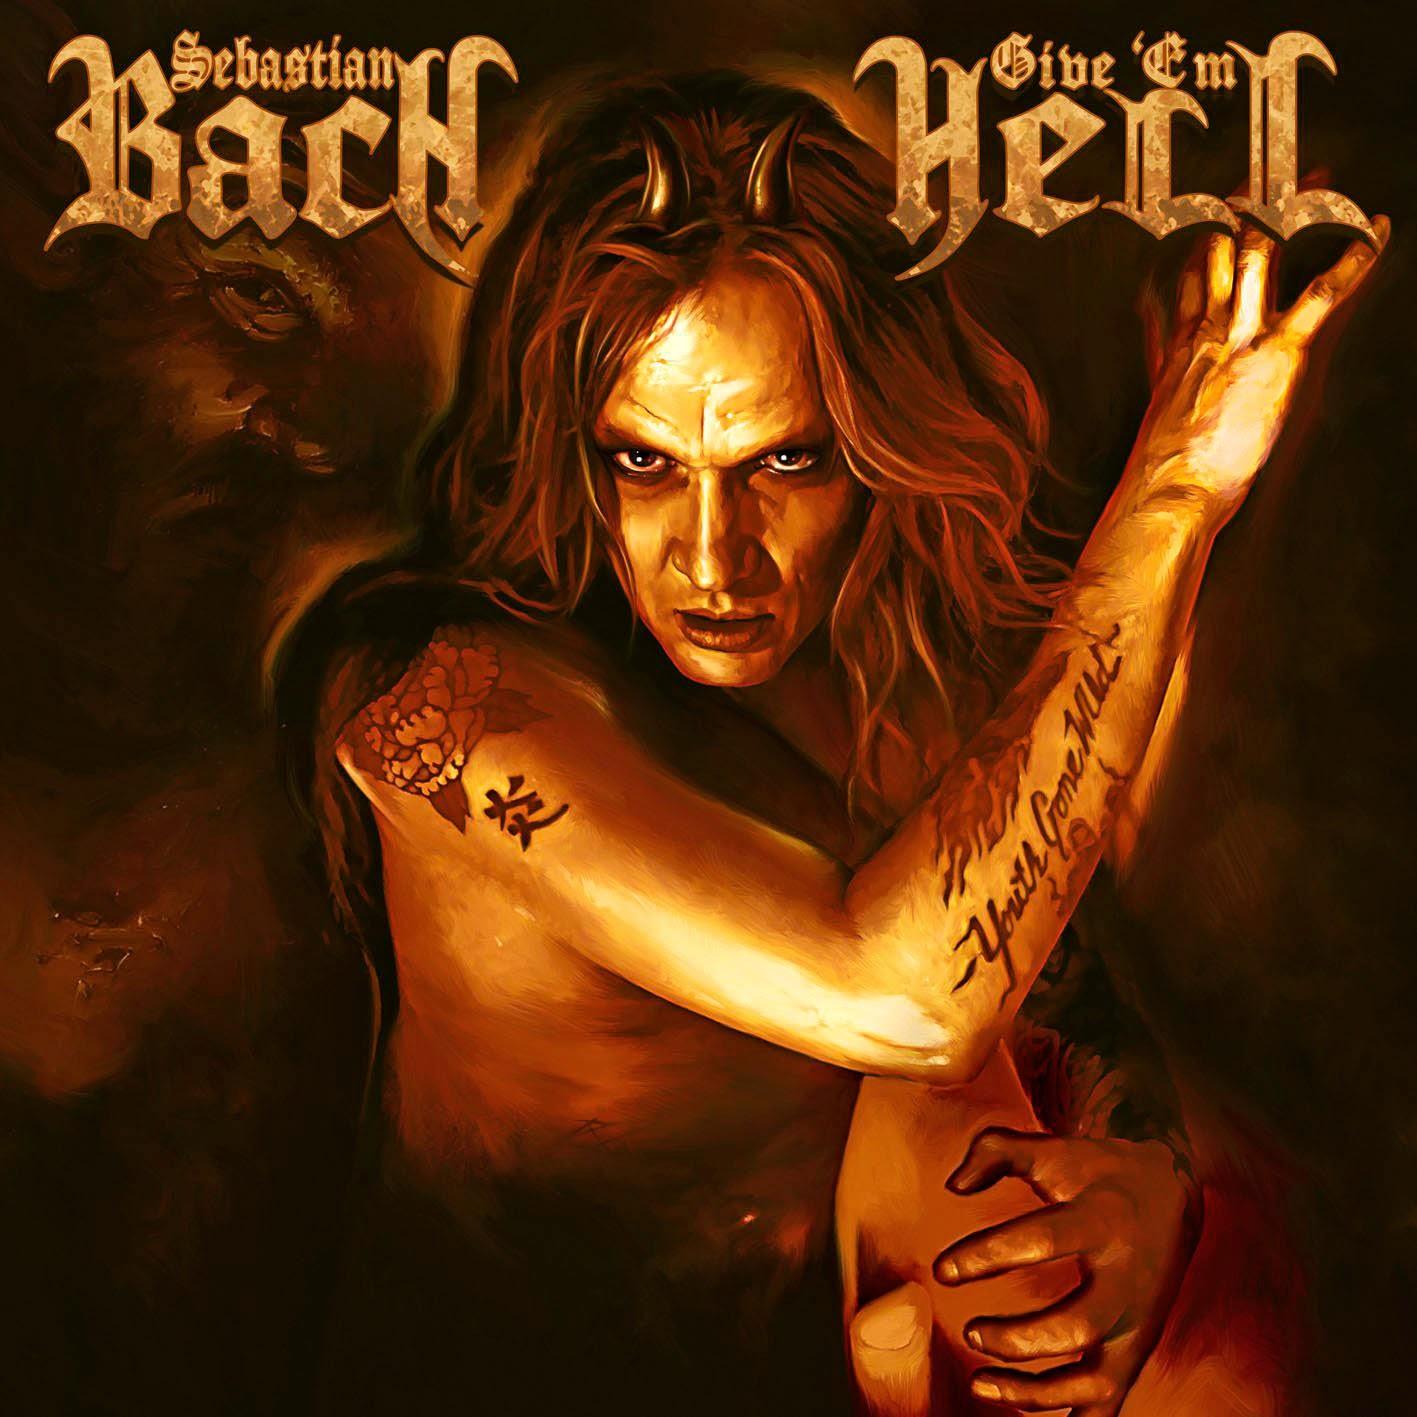 http://rock-and-metal-4-you.blogspot.de/2014/04/cd-review-sebastian-bach-give-em-hell.html